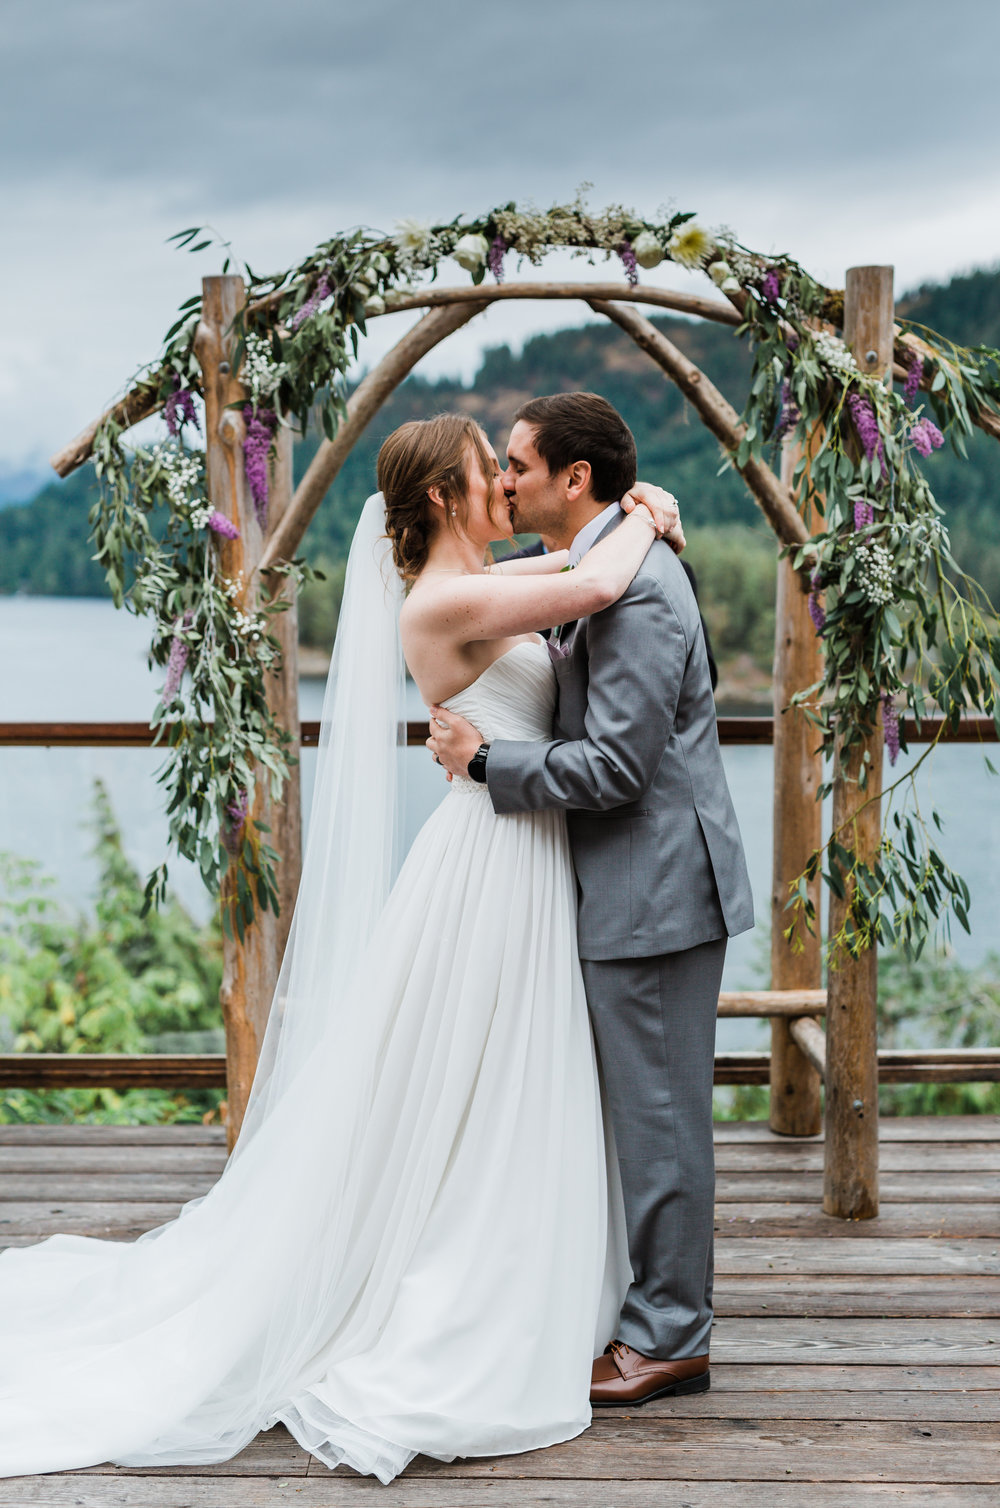 West Coast Wilderness Lodge Wedding Photos - Vancouver Wedding Photographer & Videographer - Sunshine Coast Wedding Photos - Sunshine Coast Wedding Photographer - Jennifer Picard Photography - IMG_4884.jpg